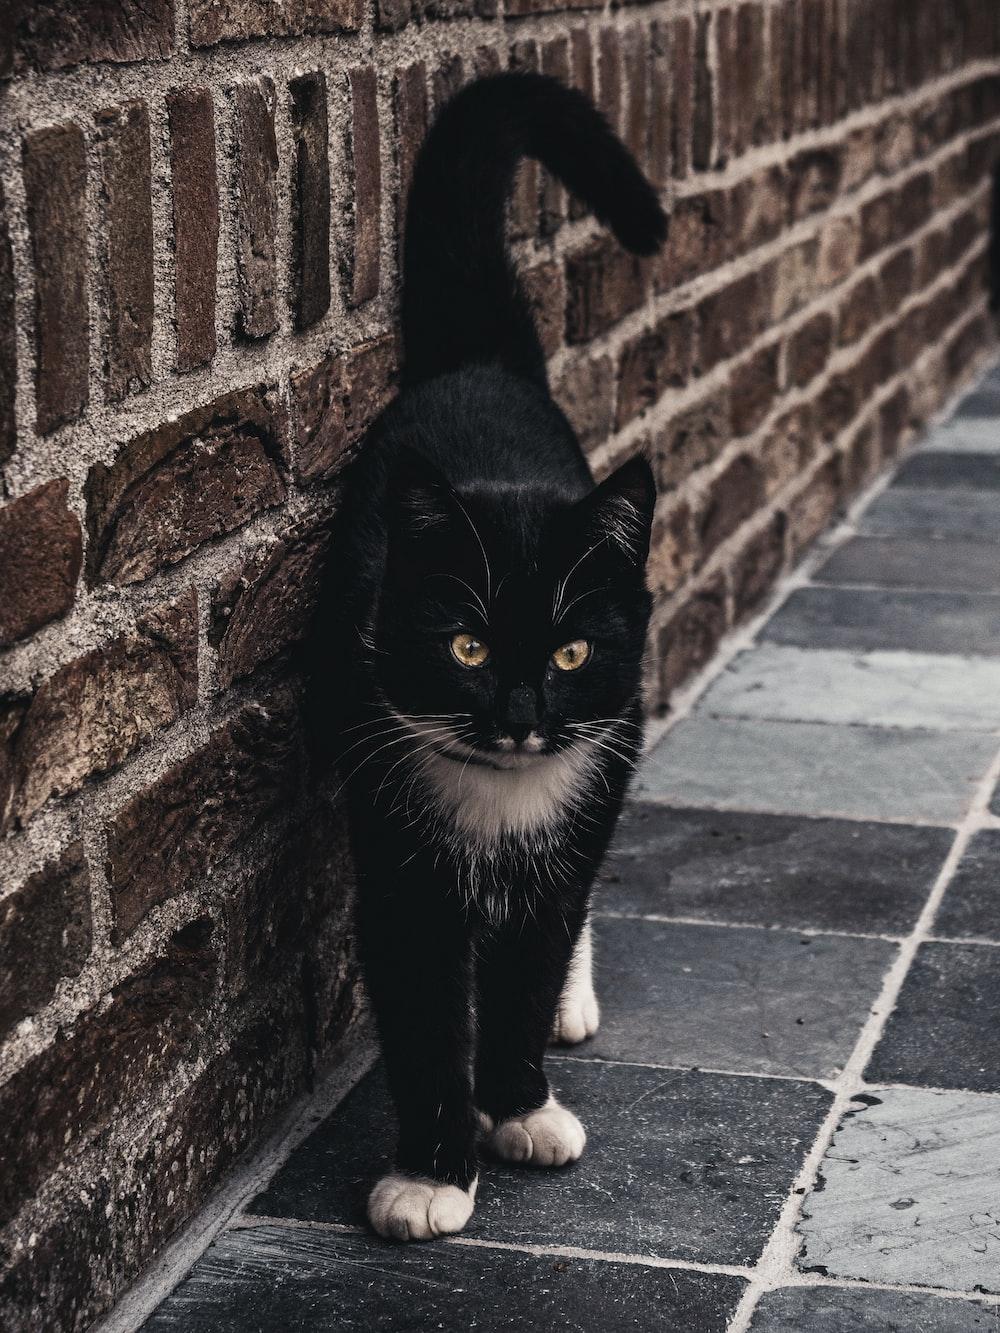 short-fur black cat near brown brick wall